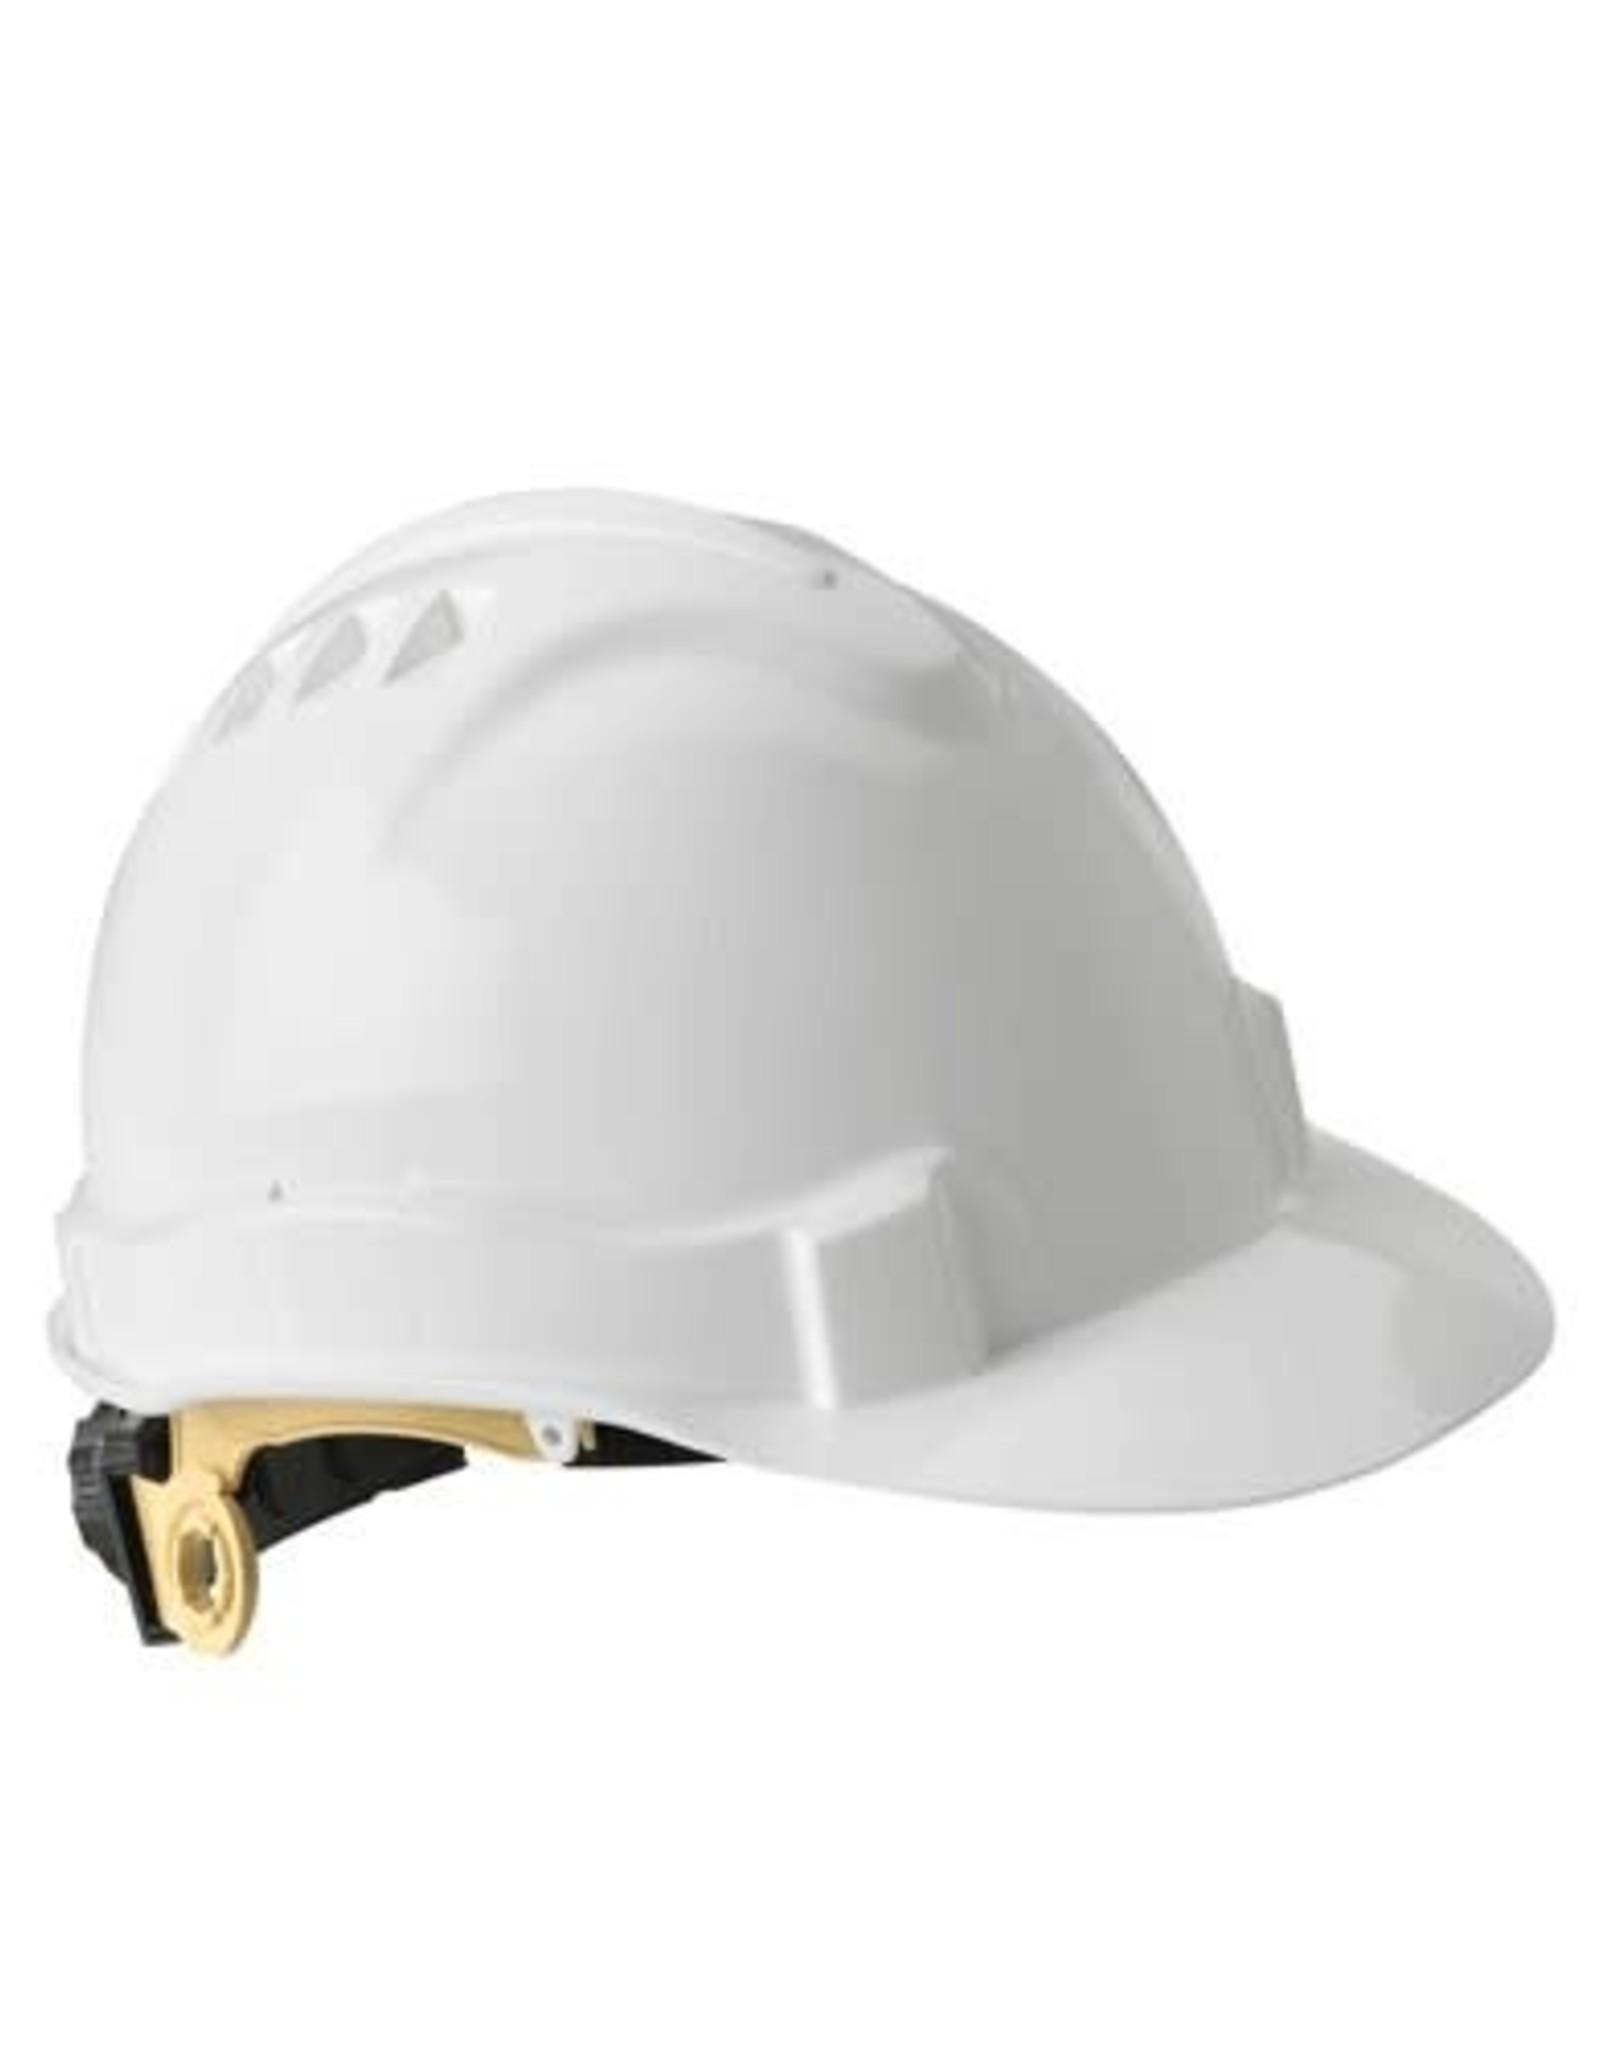 Gateway Standard Safety Helmet, Ratchet Suspension, White Shell